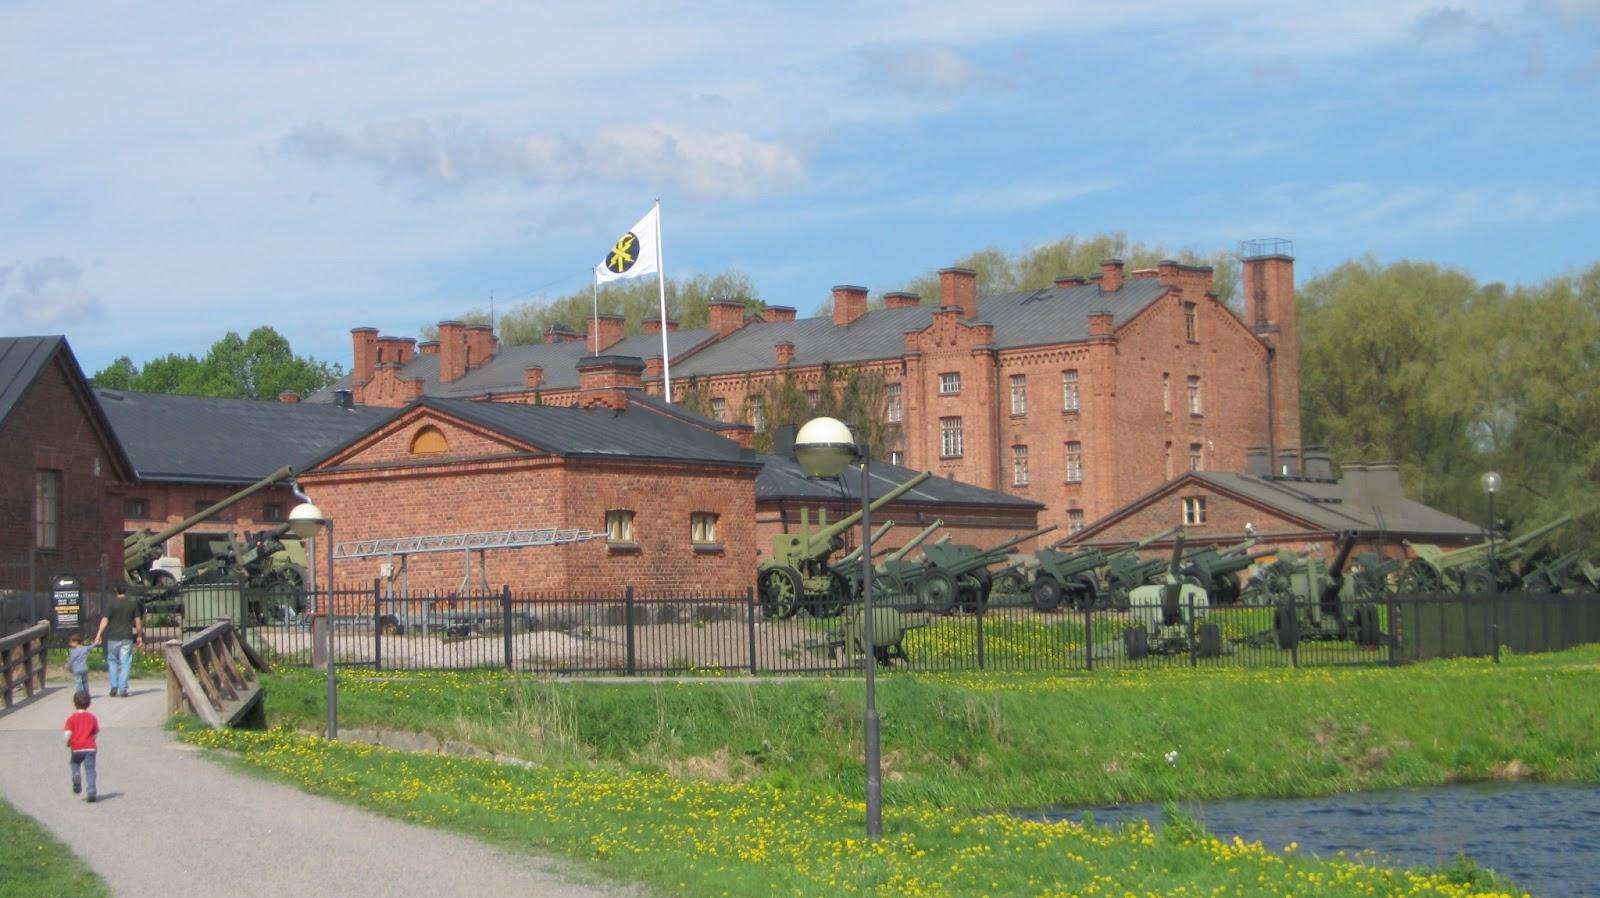 FinlandiaNoEstaTanLejos: Hämeenlinna